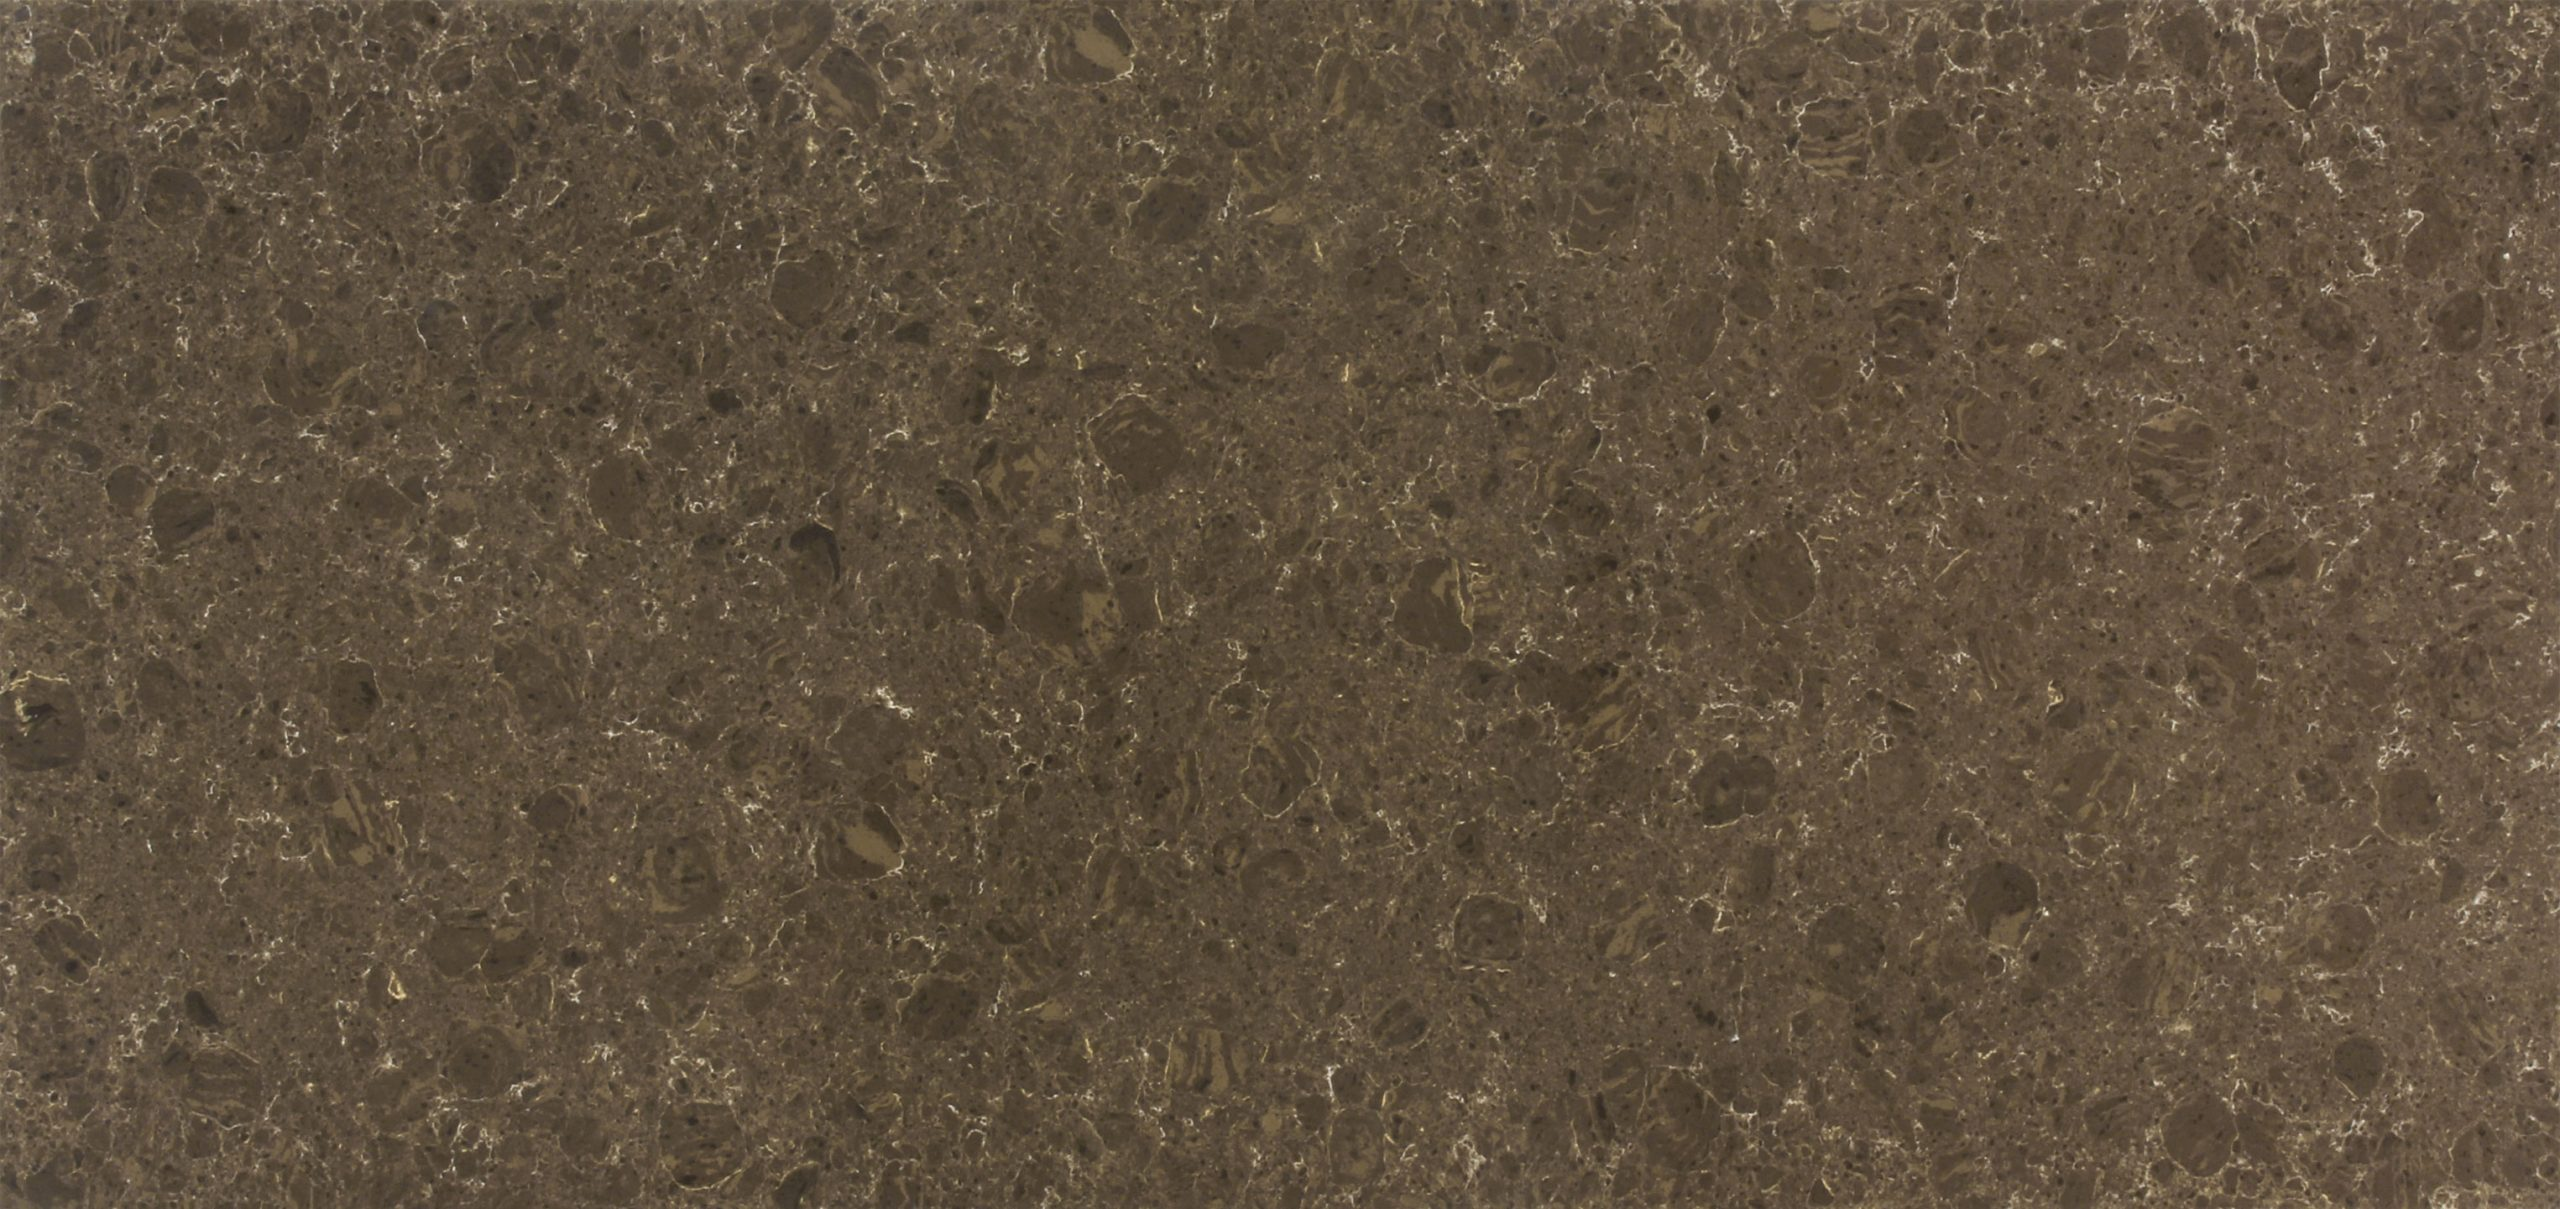 Vicostone Dark Emparador BQ8560 02